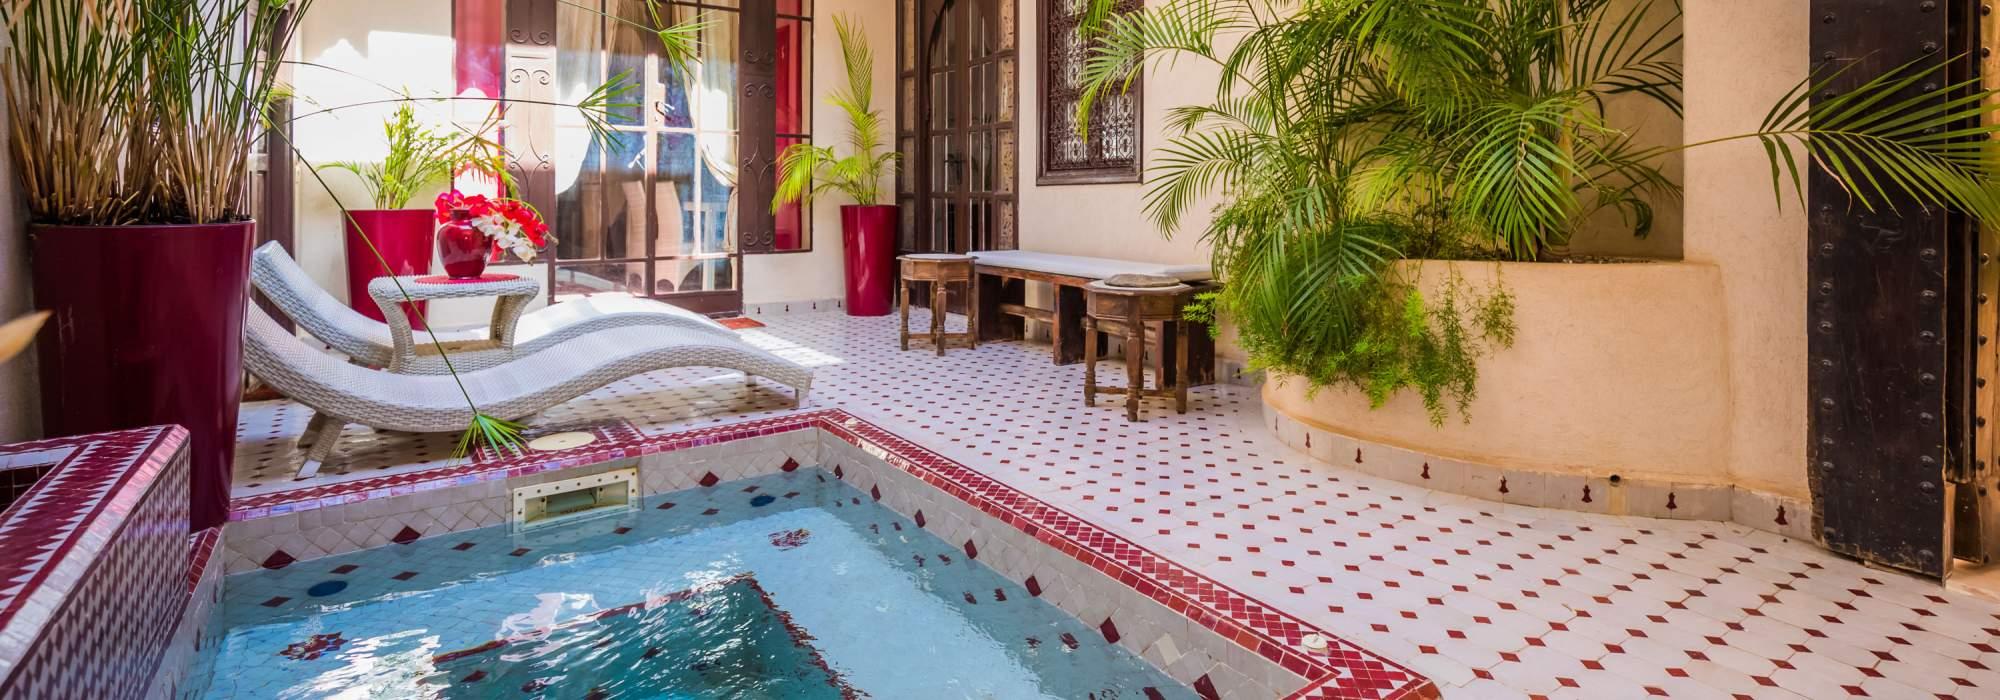 riad palmeraie a vendre marrakech